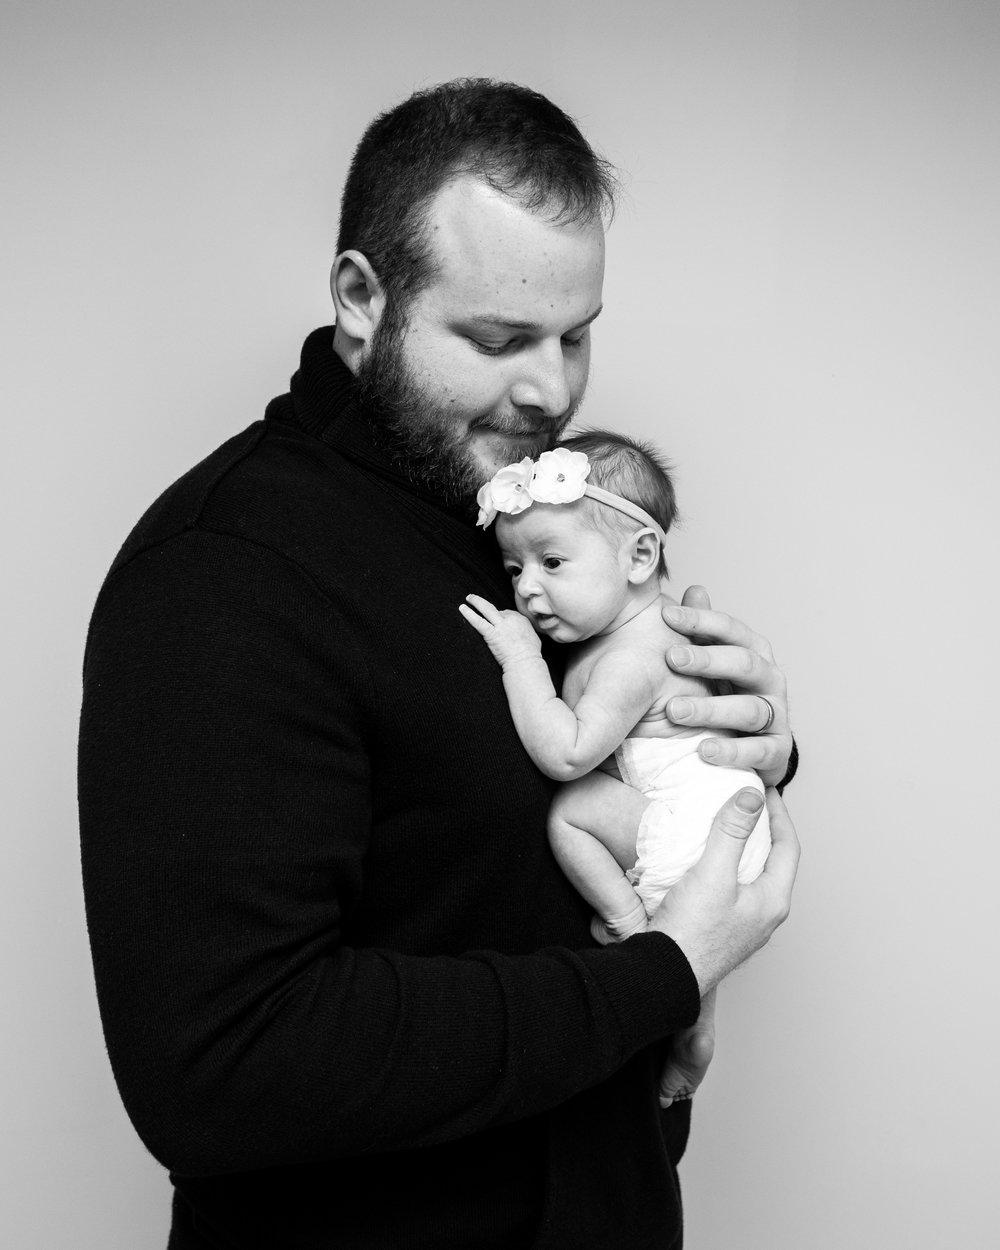 Kyla Jo Photography // Muncie, Indiana // Newborn Photos // Newborn Session // Muncie indiana newborn session // Newborn photographer muncie indiana // indiana newborn photographer // Dadin Newborn Photos